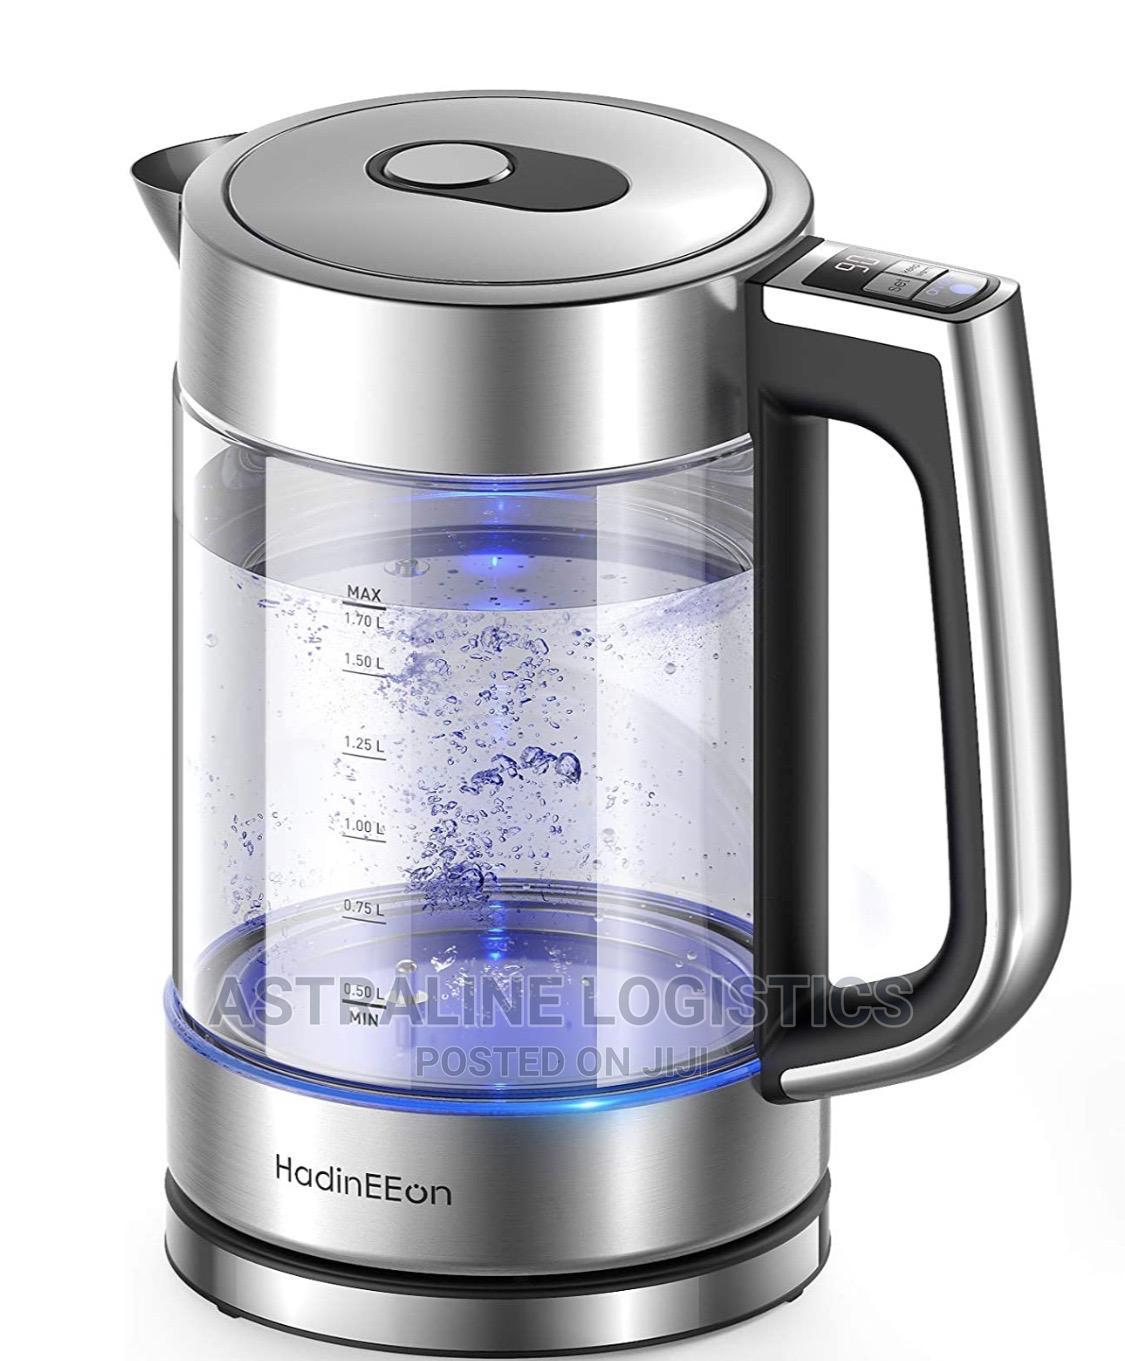 Hadineeon Electric Kettle, Various Temperature Tea Kettle